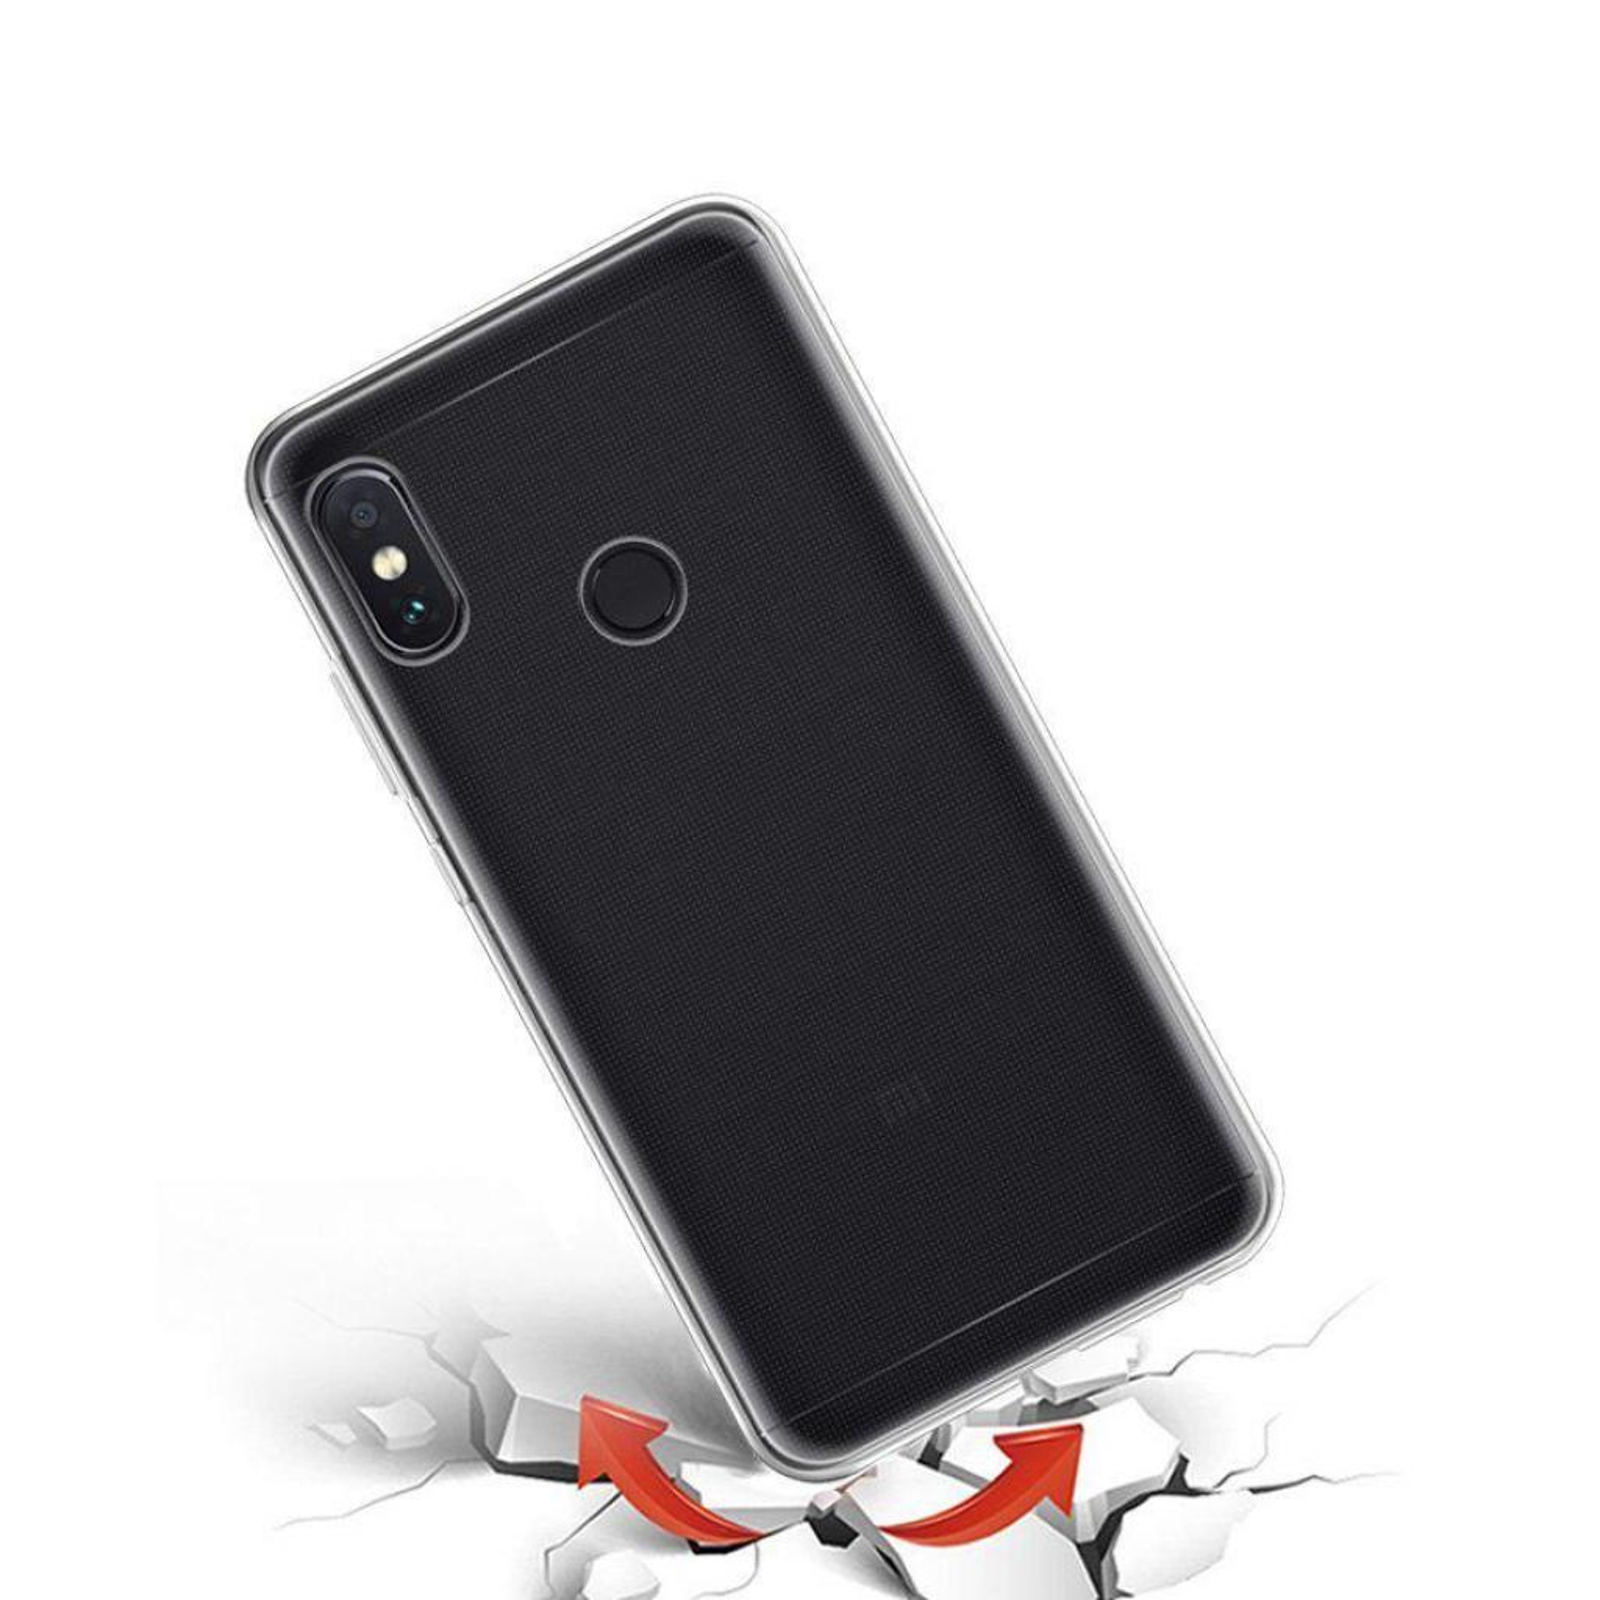 Чехол для моб. телефона Laudtec для Xiaomi Redmi Note 5 Pro Clear tpu (Transperent) (LC-XRN5P) изображение 9